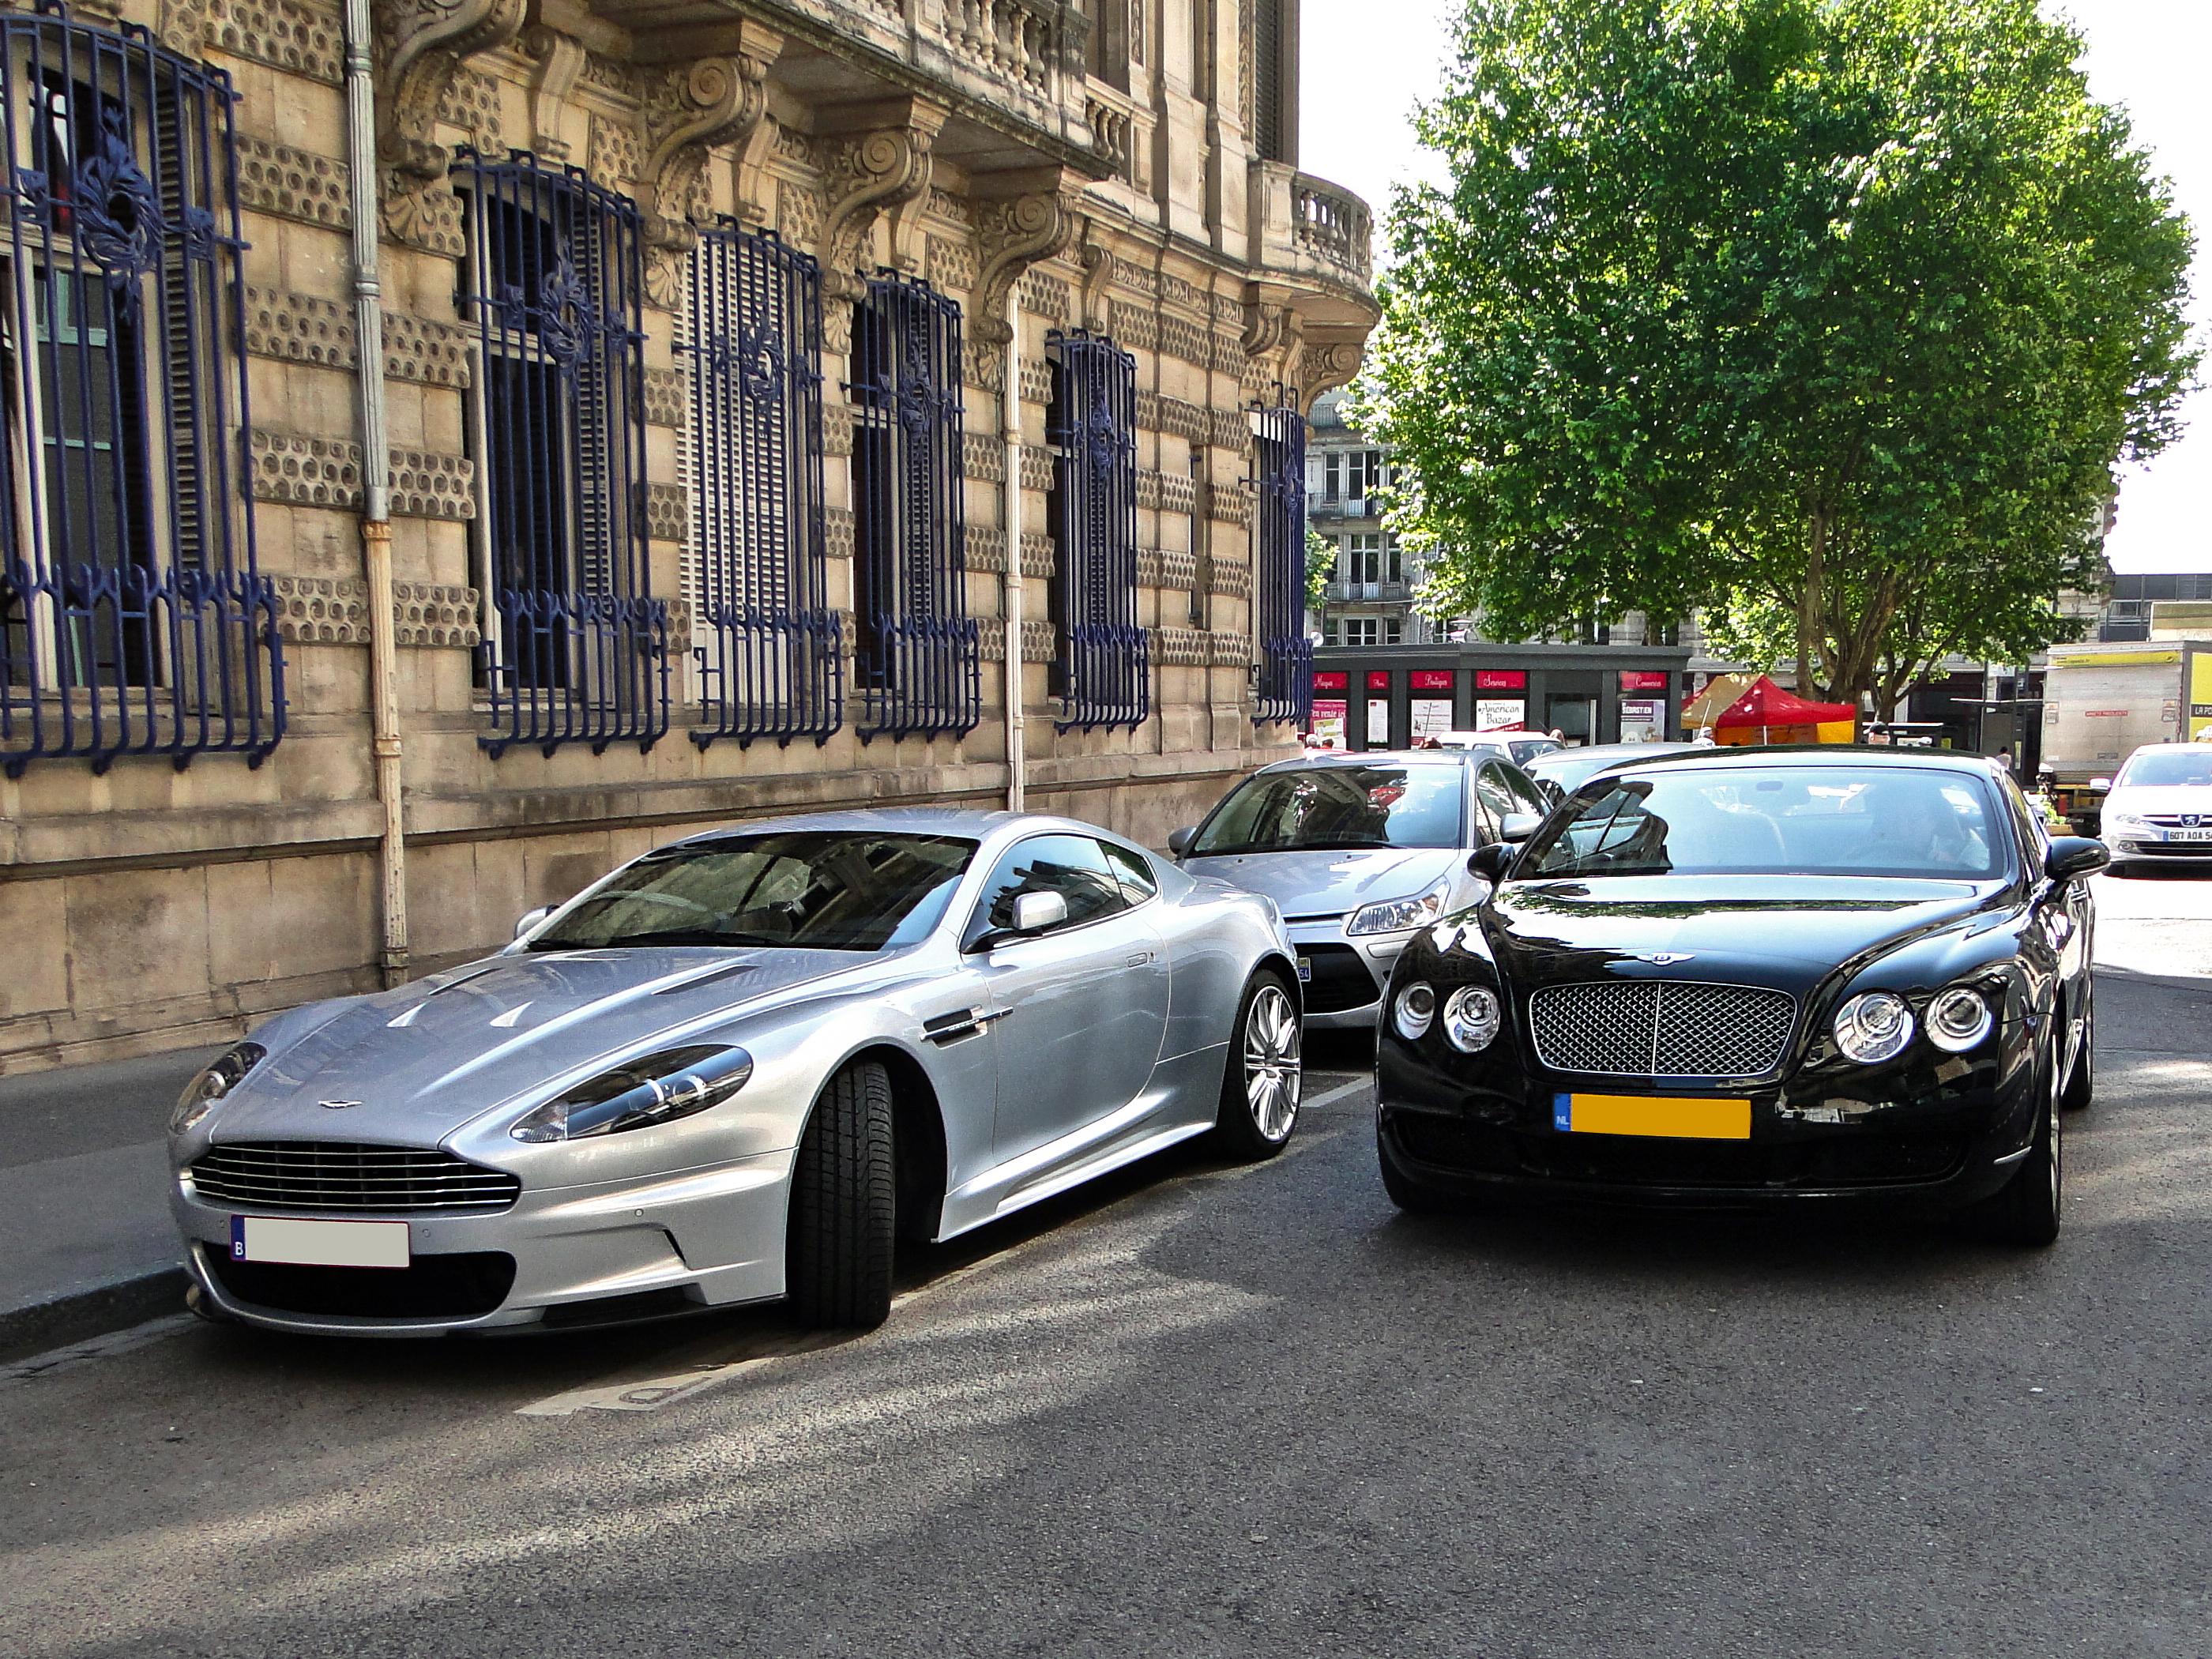 File Aston Martin Dbs Bentley Continental Gt Flickr Alexandre Prévot Jpg Wikimedia Commons